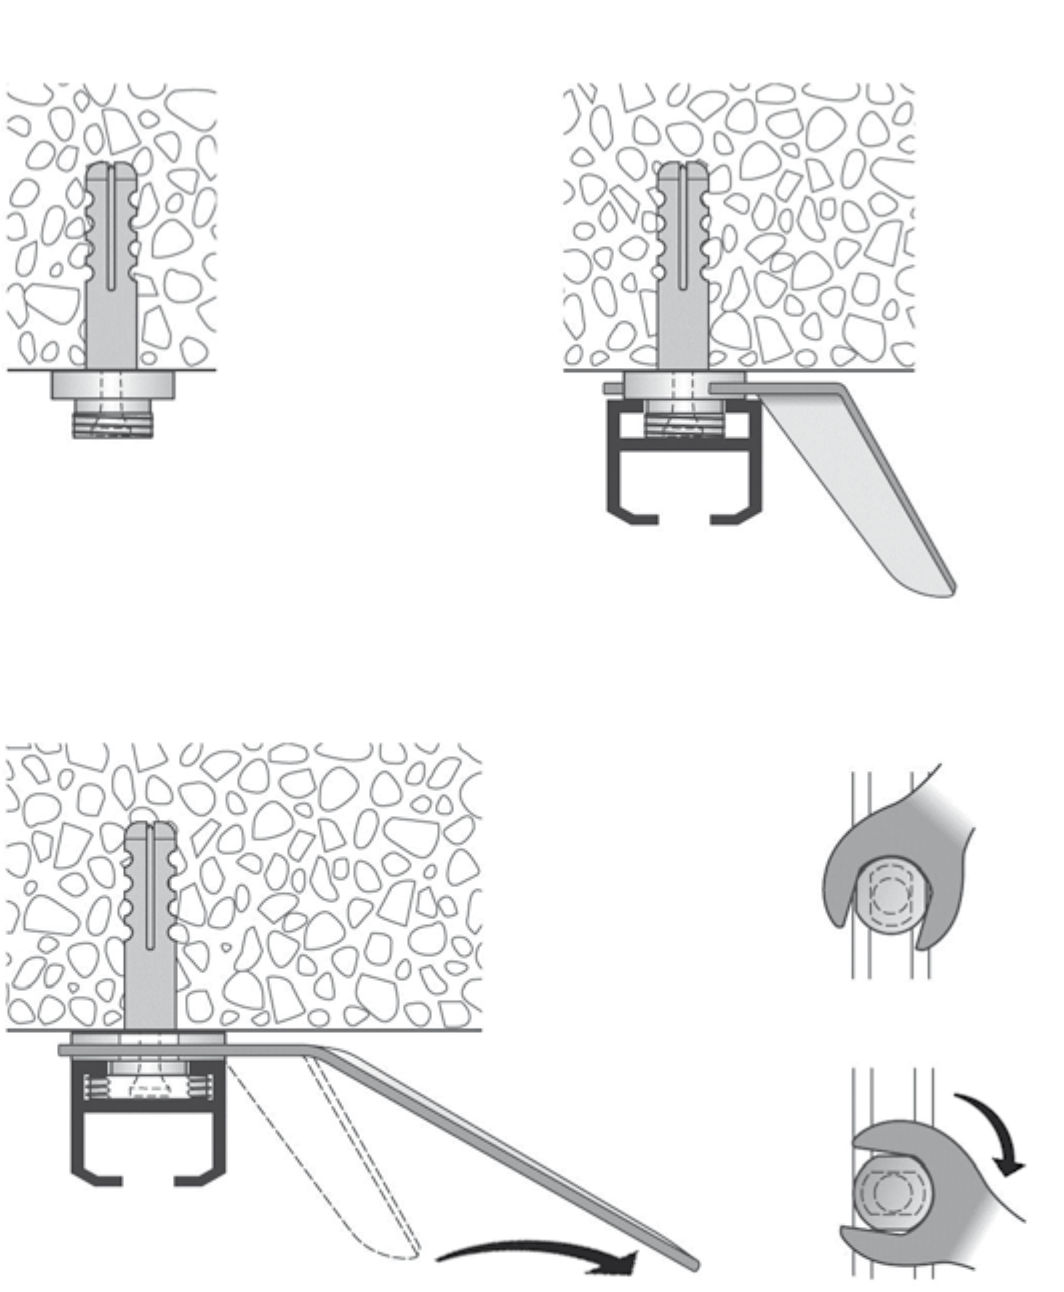 schema binario acciaio inox per esterno binario outdoor tendagi binario per esterno certificato binario per uso esterno binario poggiolo binario